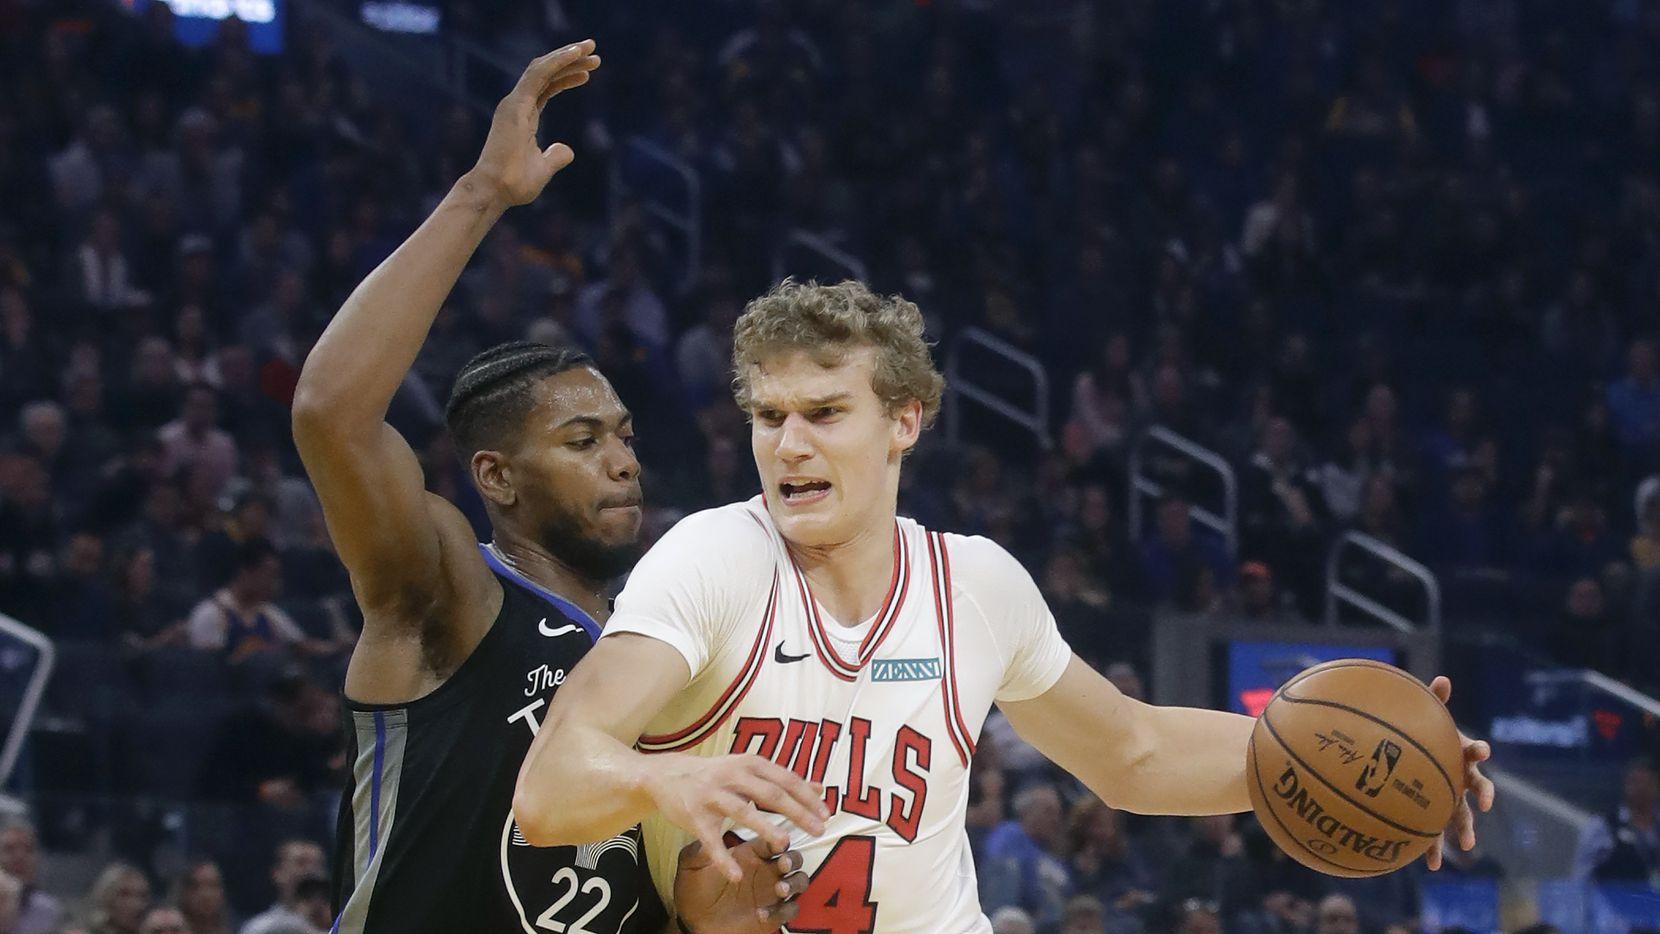 Chicago Bulls forward Lauri Markkanen (24) drives against Golden State Warriors forward Glenn Robinson III (22) during the first half of an NBA basketball game in San Francisco, Wednesday, Nov. 27, 2019.